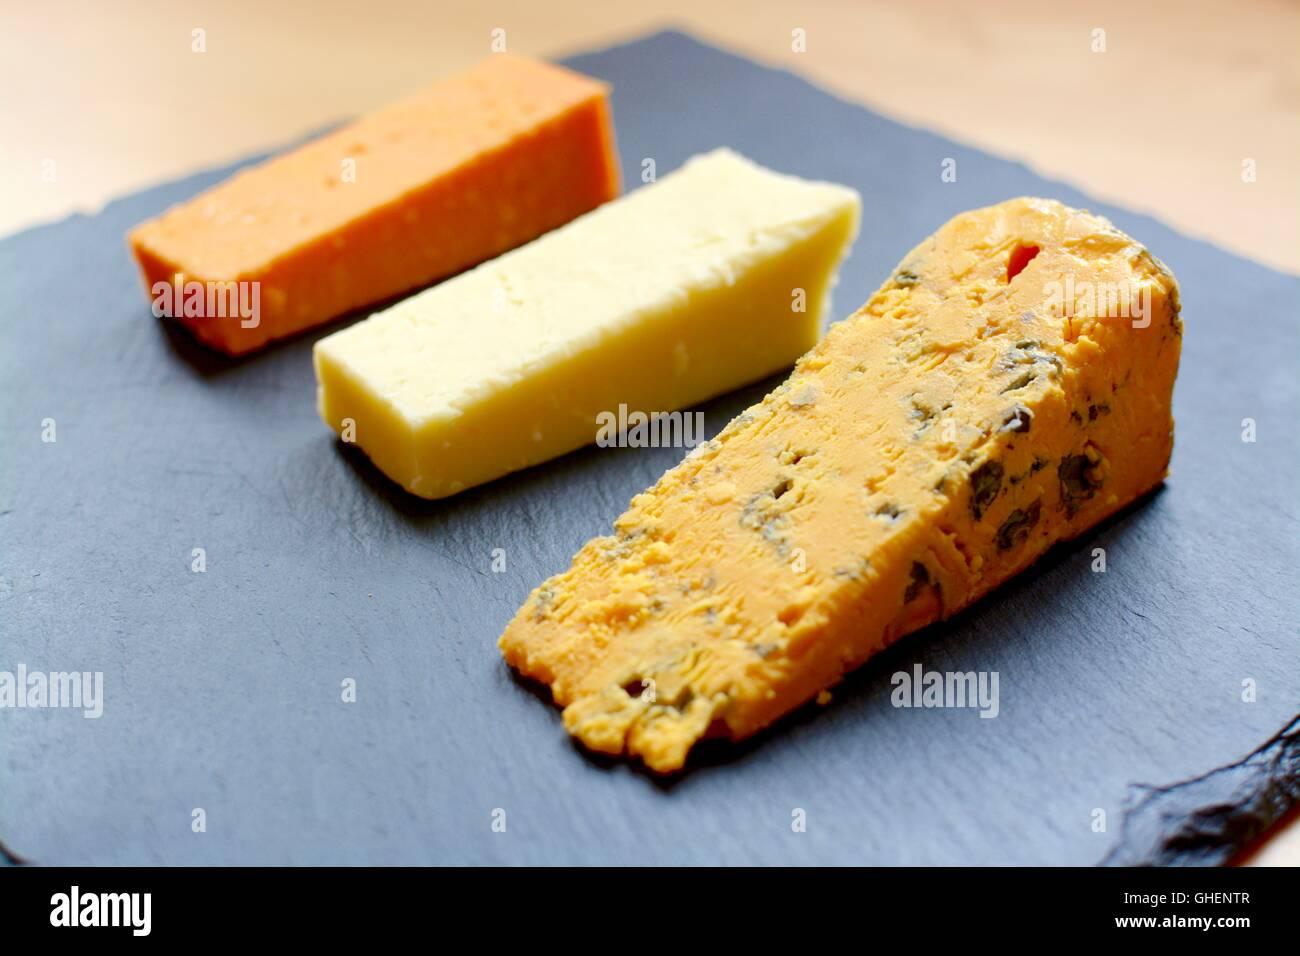 Tres quesos servidos en pizarra negra Imagen De Stock